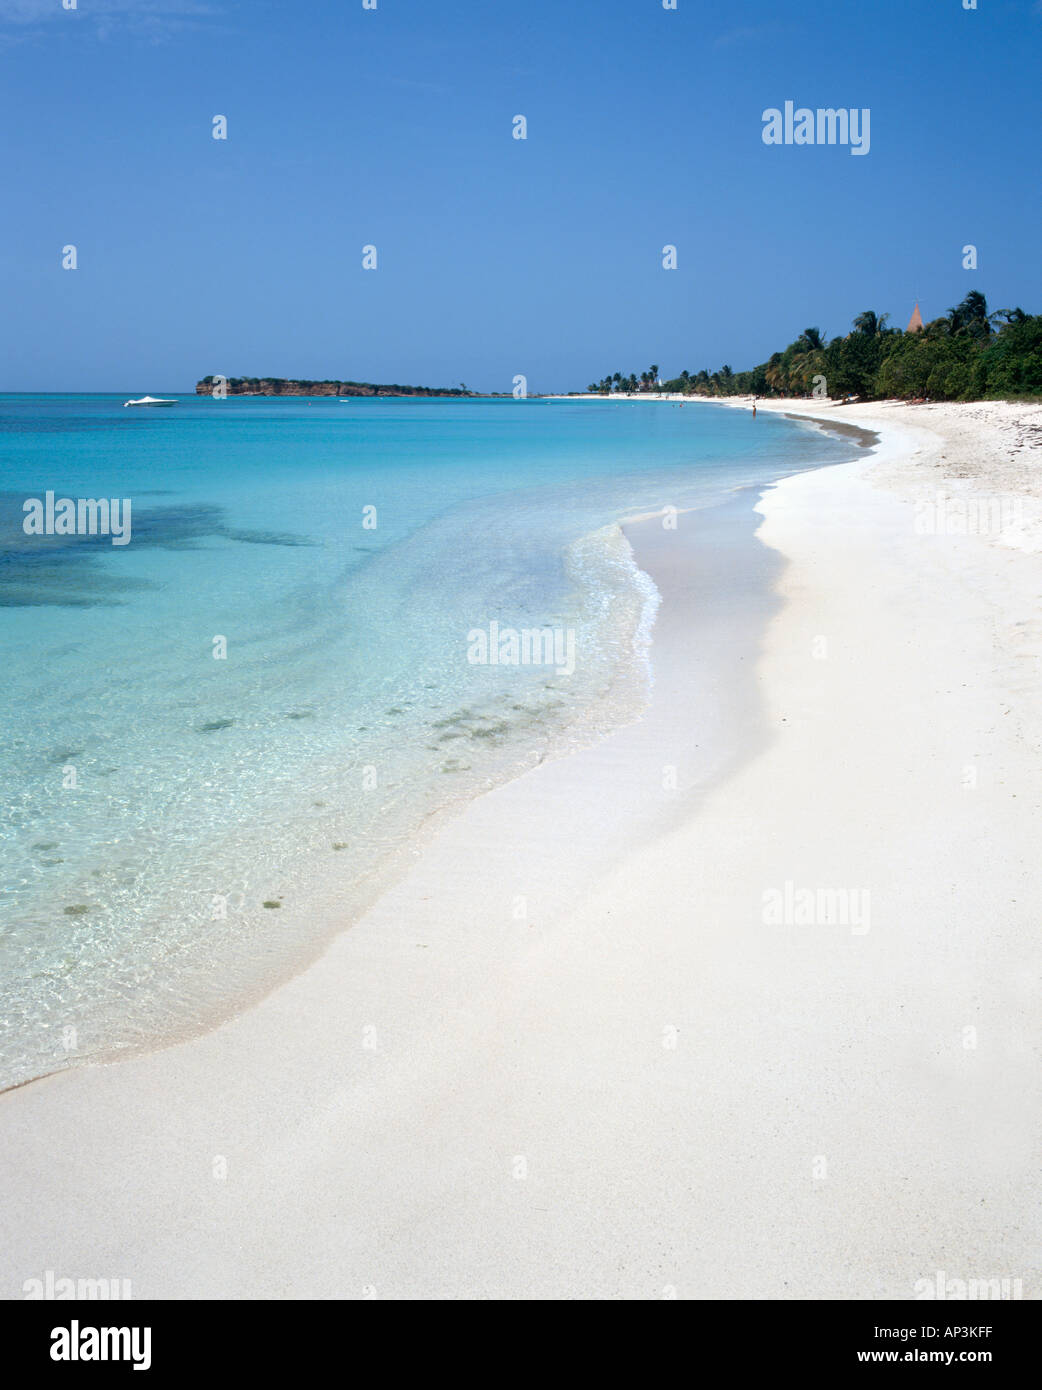 Spiaggia deserta, Runaway Bay, Antigua, West Indies, dei Caraibi Immagini Stock